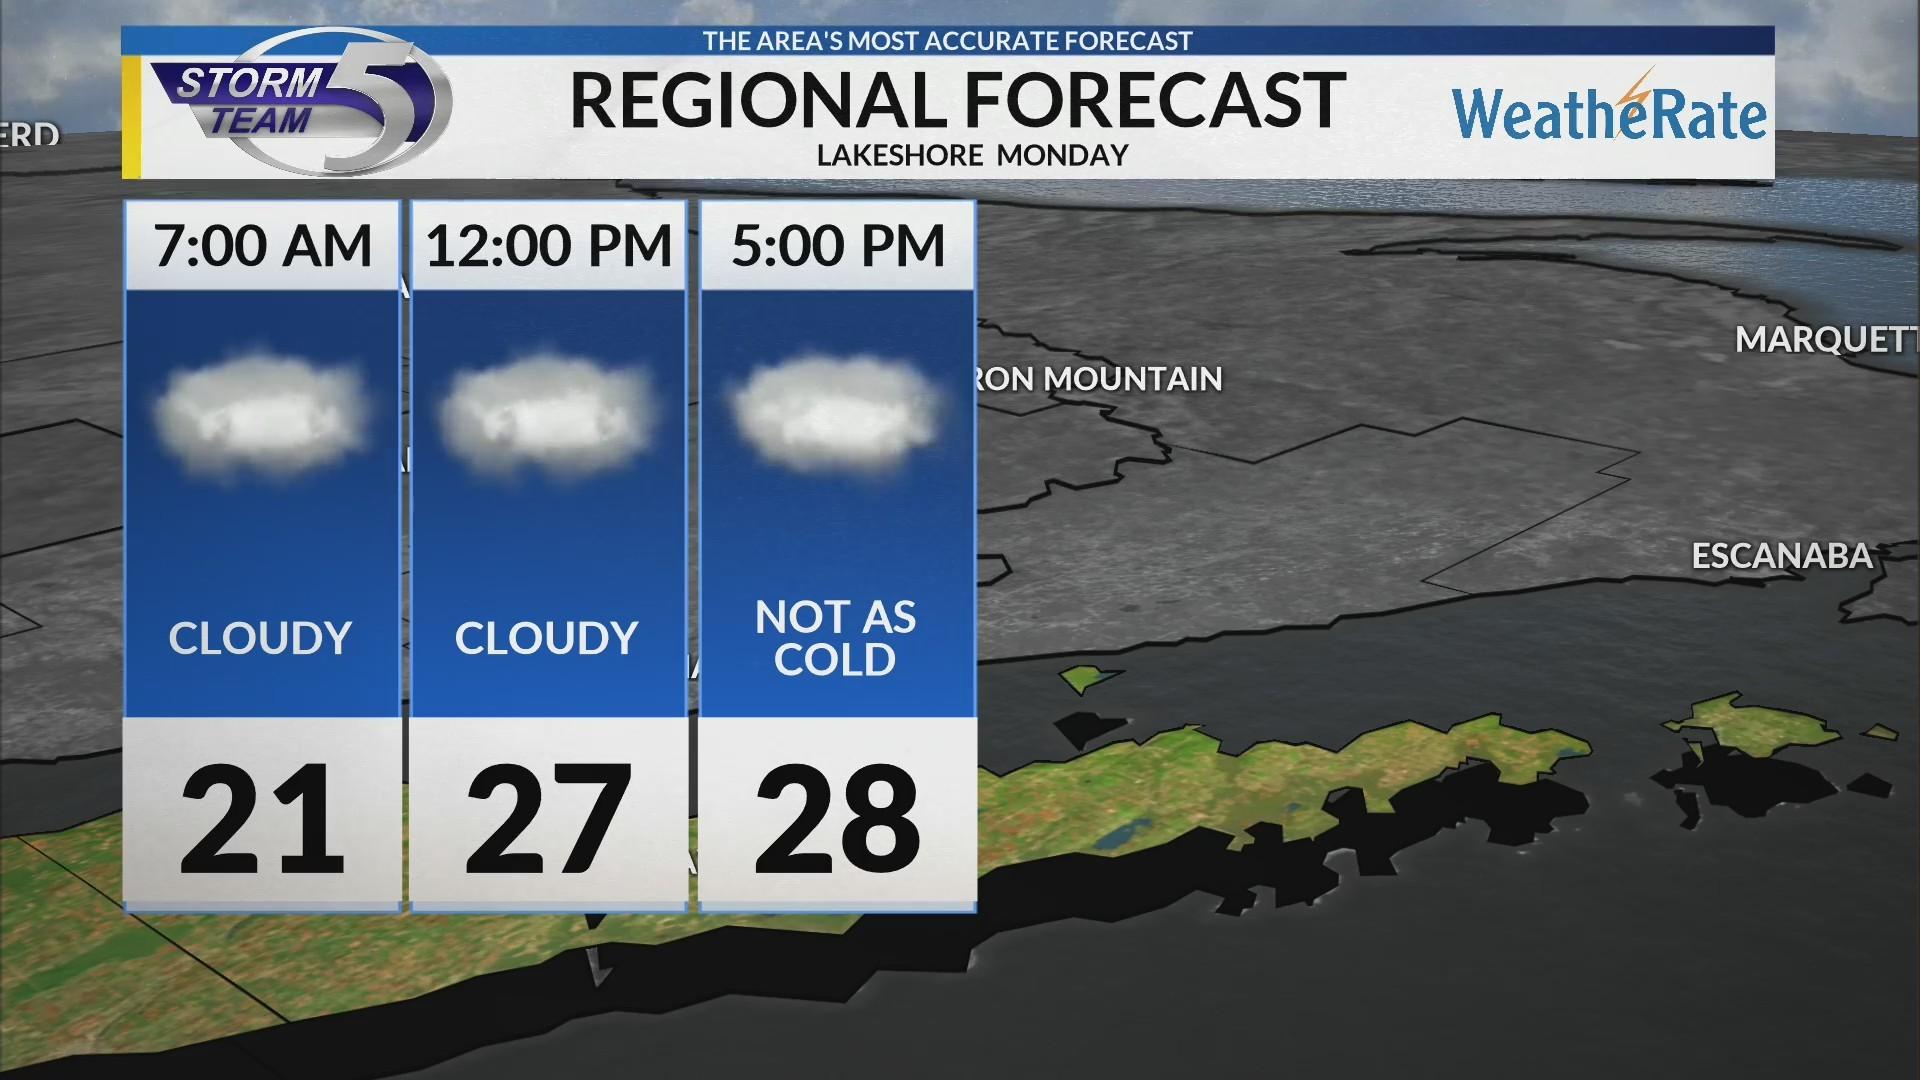 Regional Forecast: Lakeshore 2-11